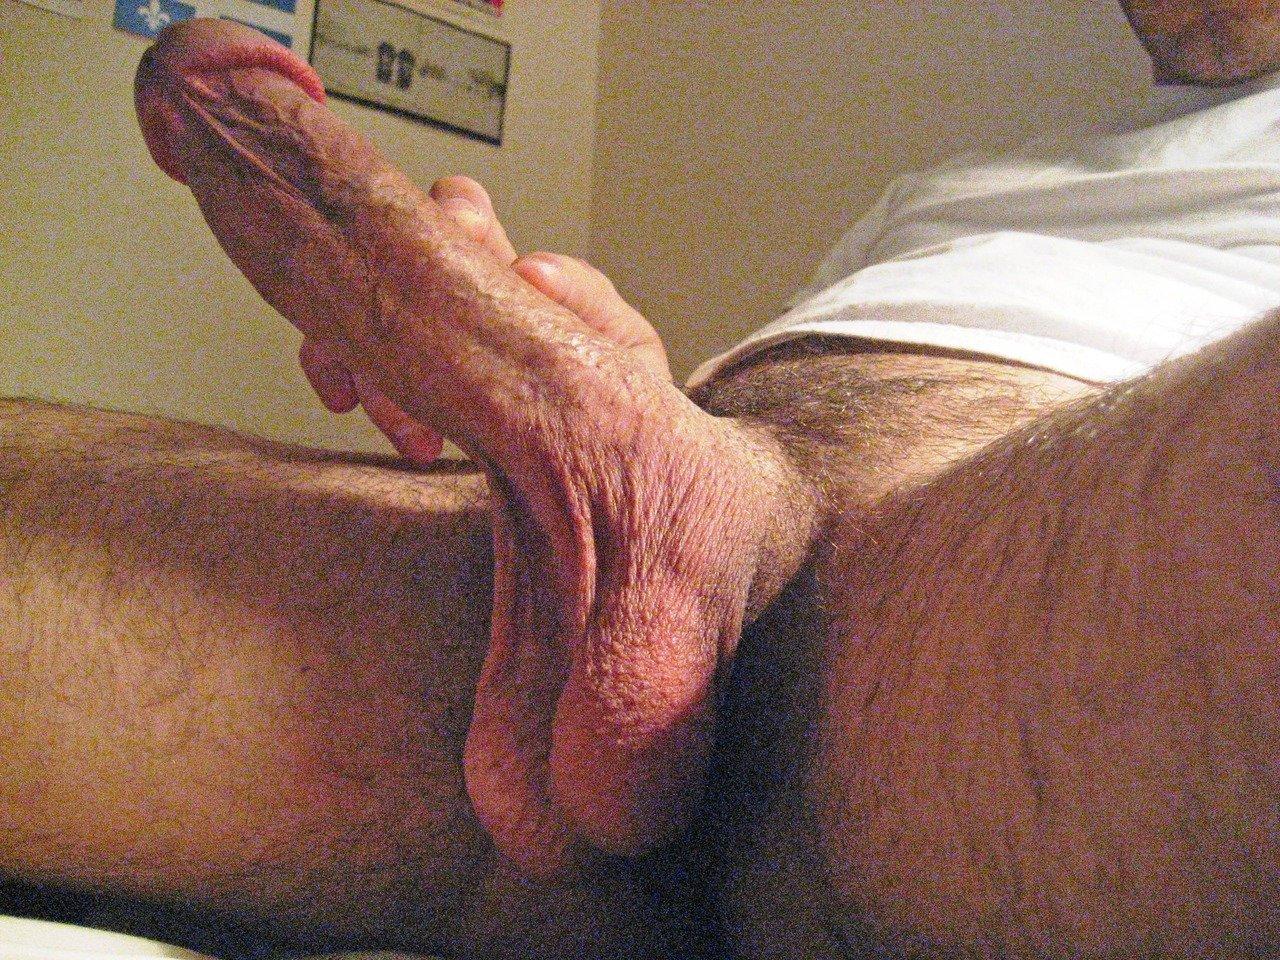 thick dick big balls № 43210